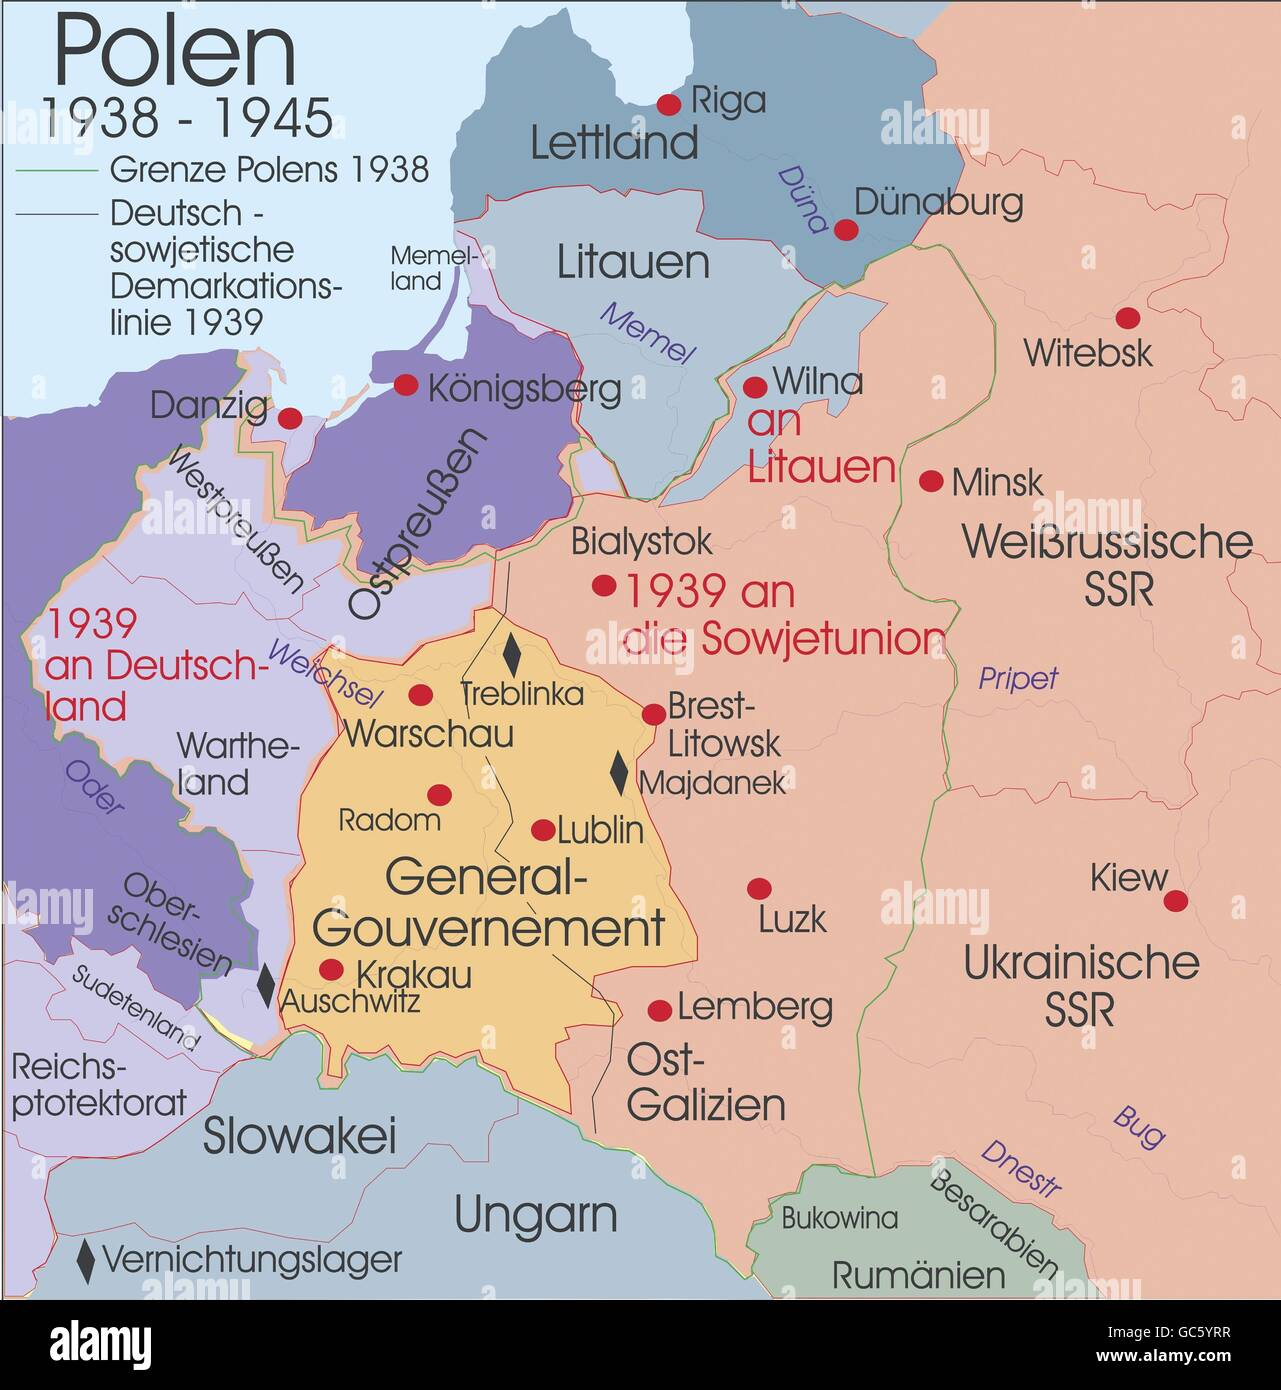 Polen 1938